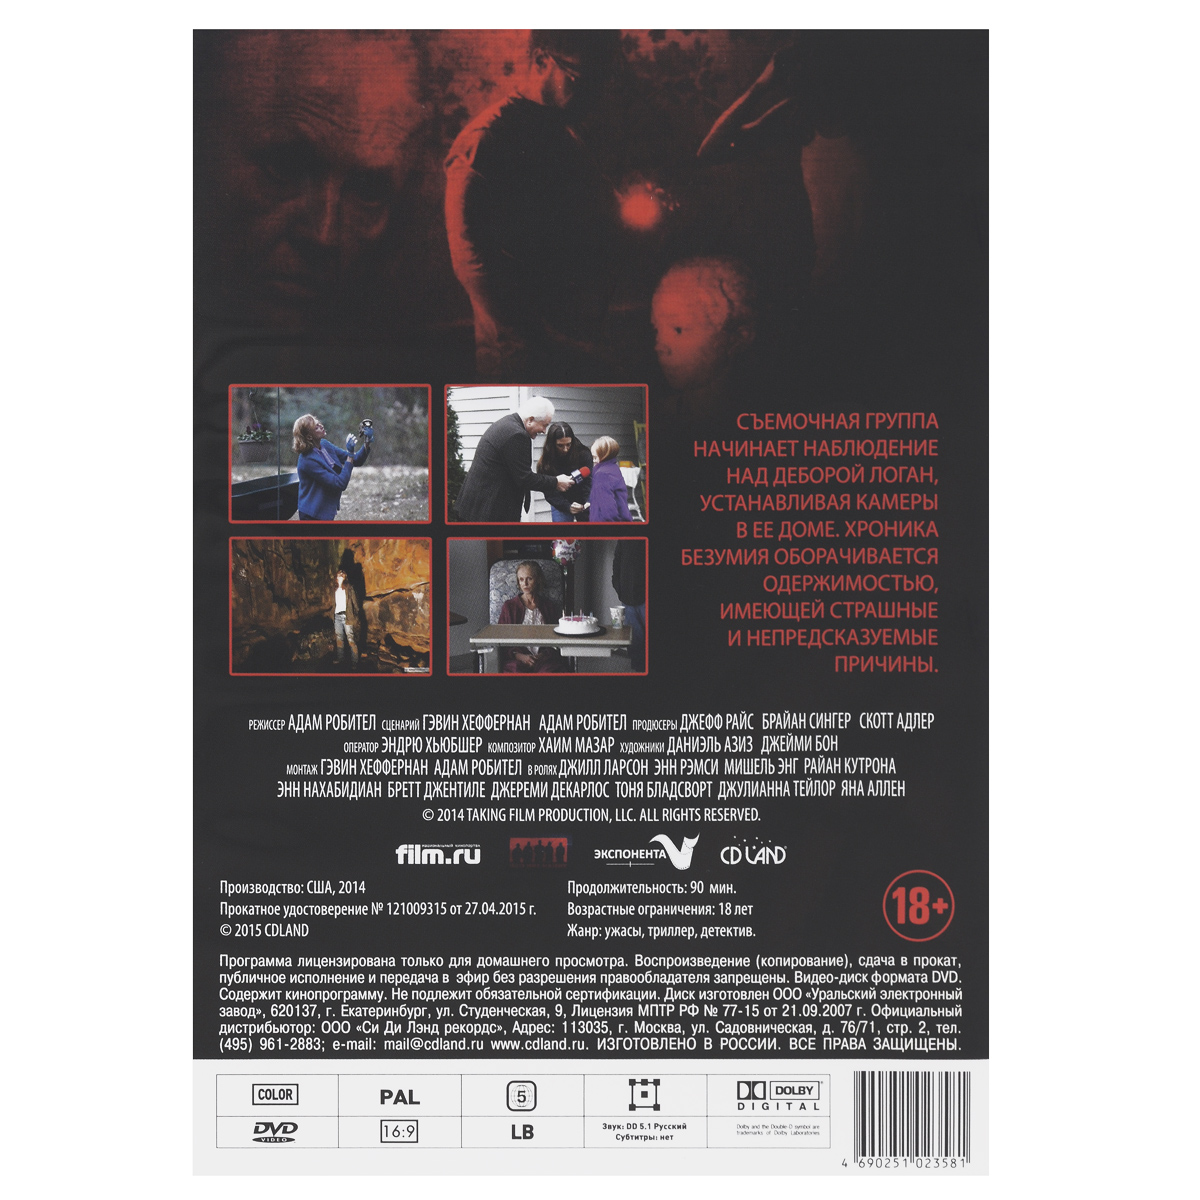 Демоны Деборы Логан Bad Hat Harry Productions,Jeff Rice Films,Casadelic Pictures